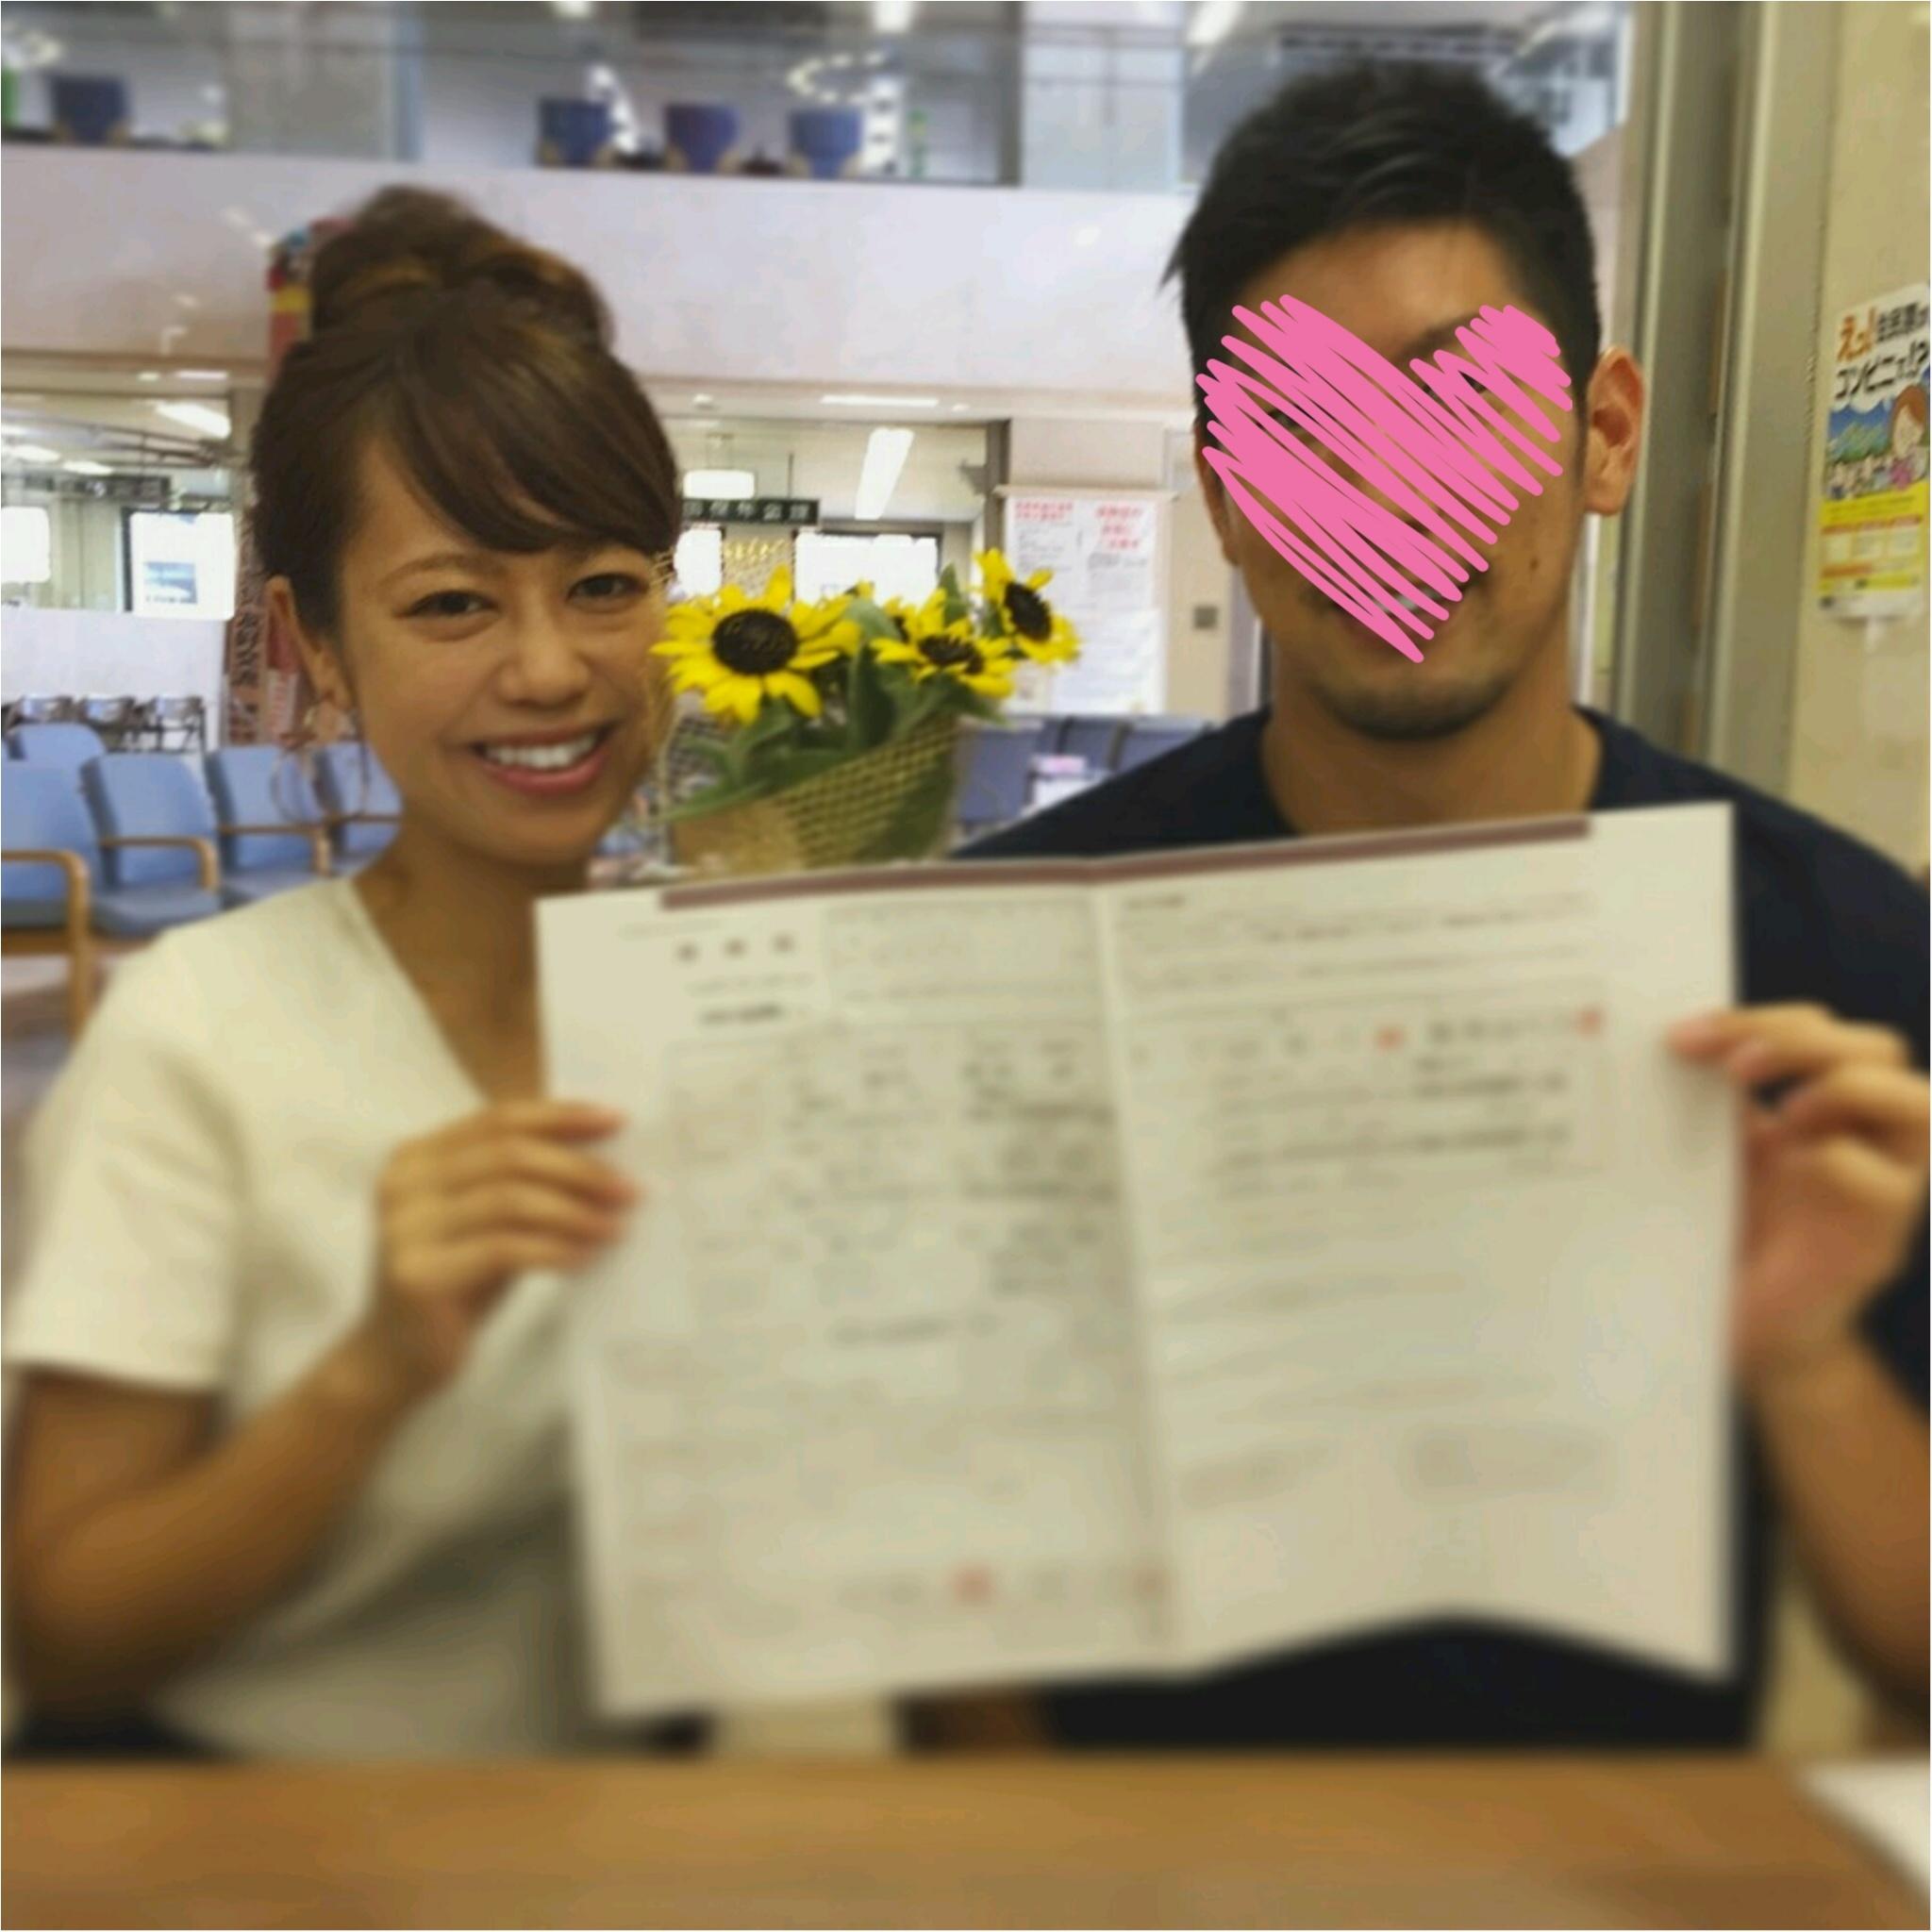 【We got married】大好きな彼と夫婦になりました!!_1